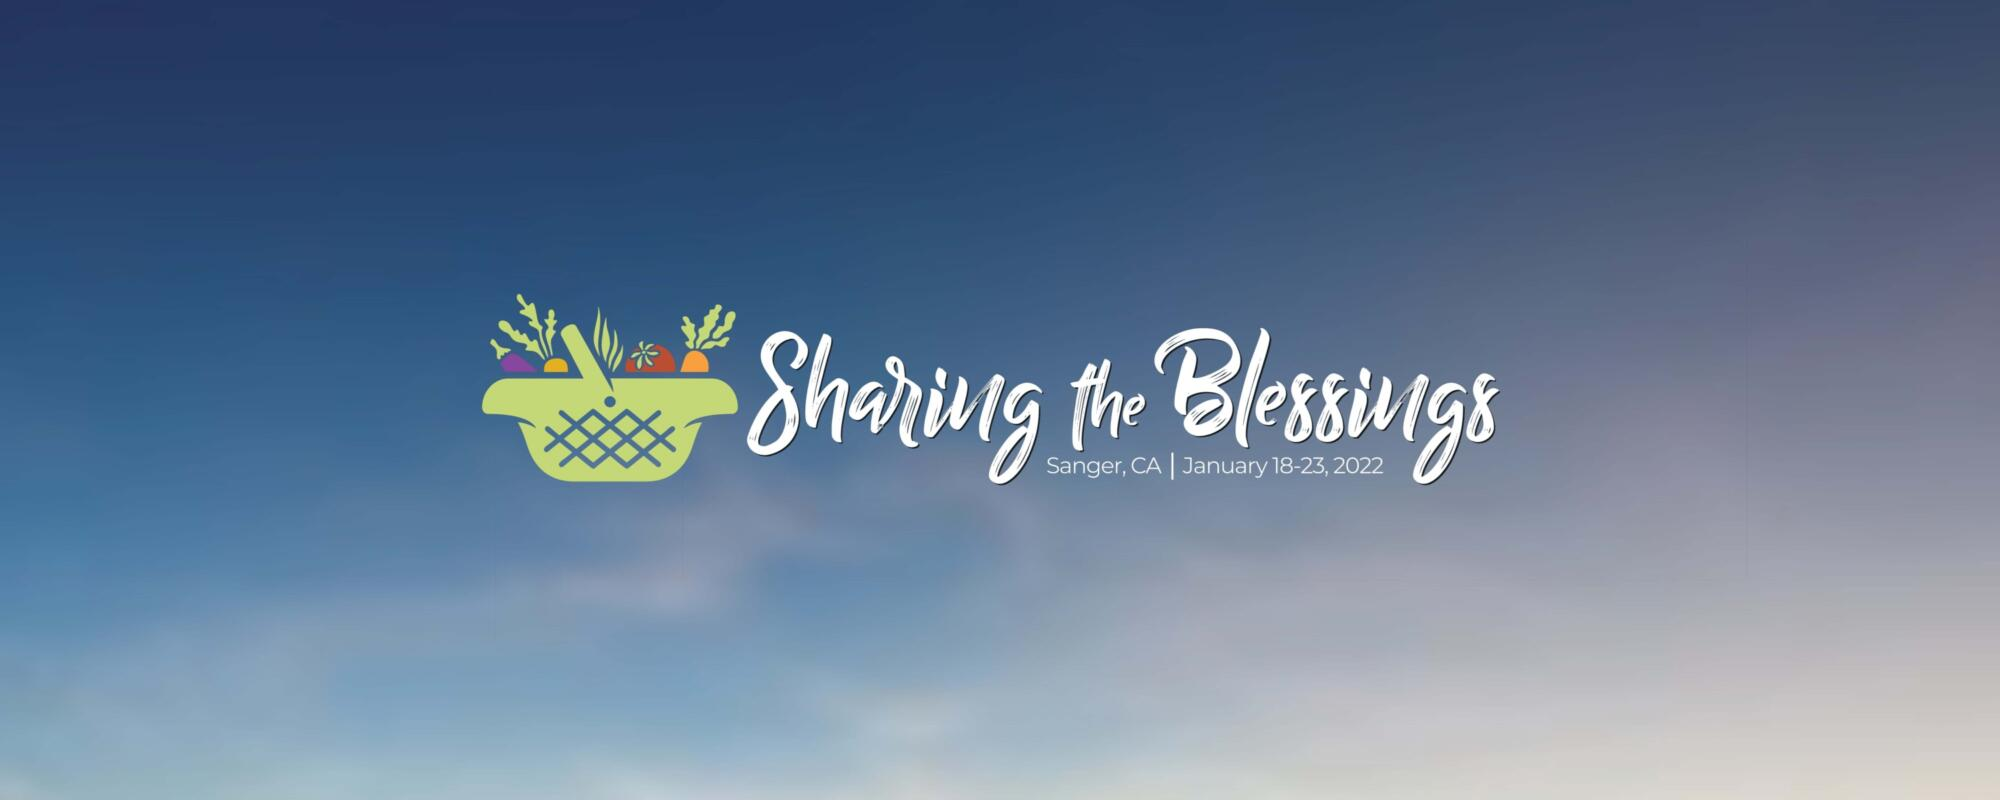 Sharing the blessings banner sky